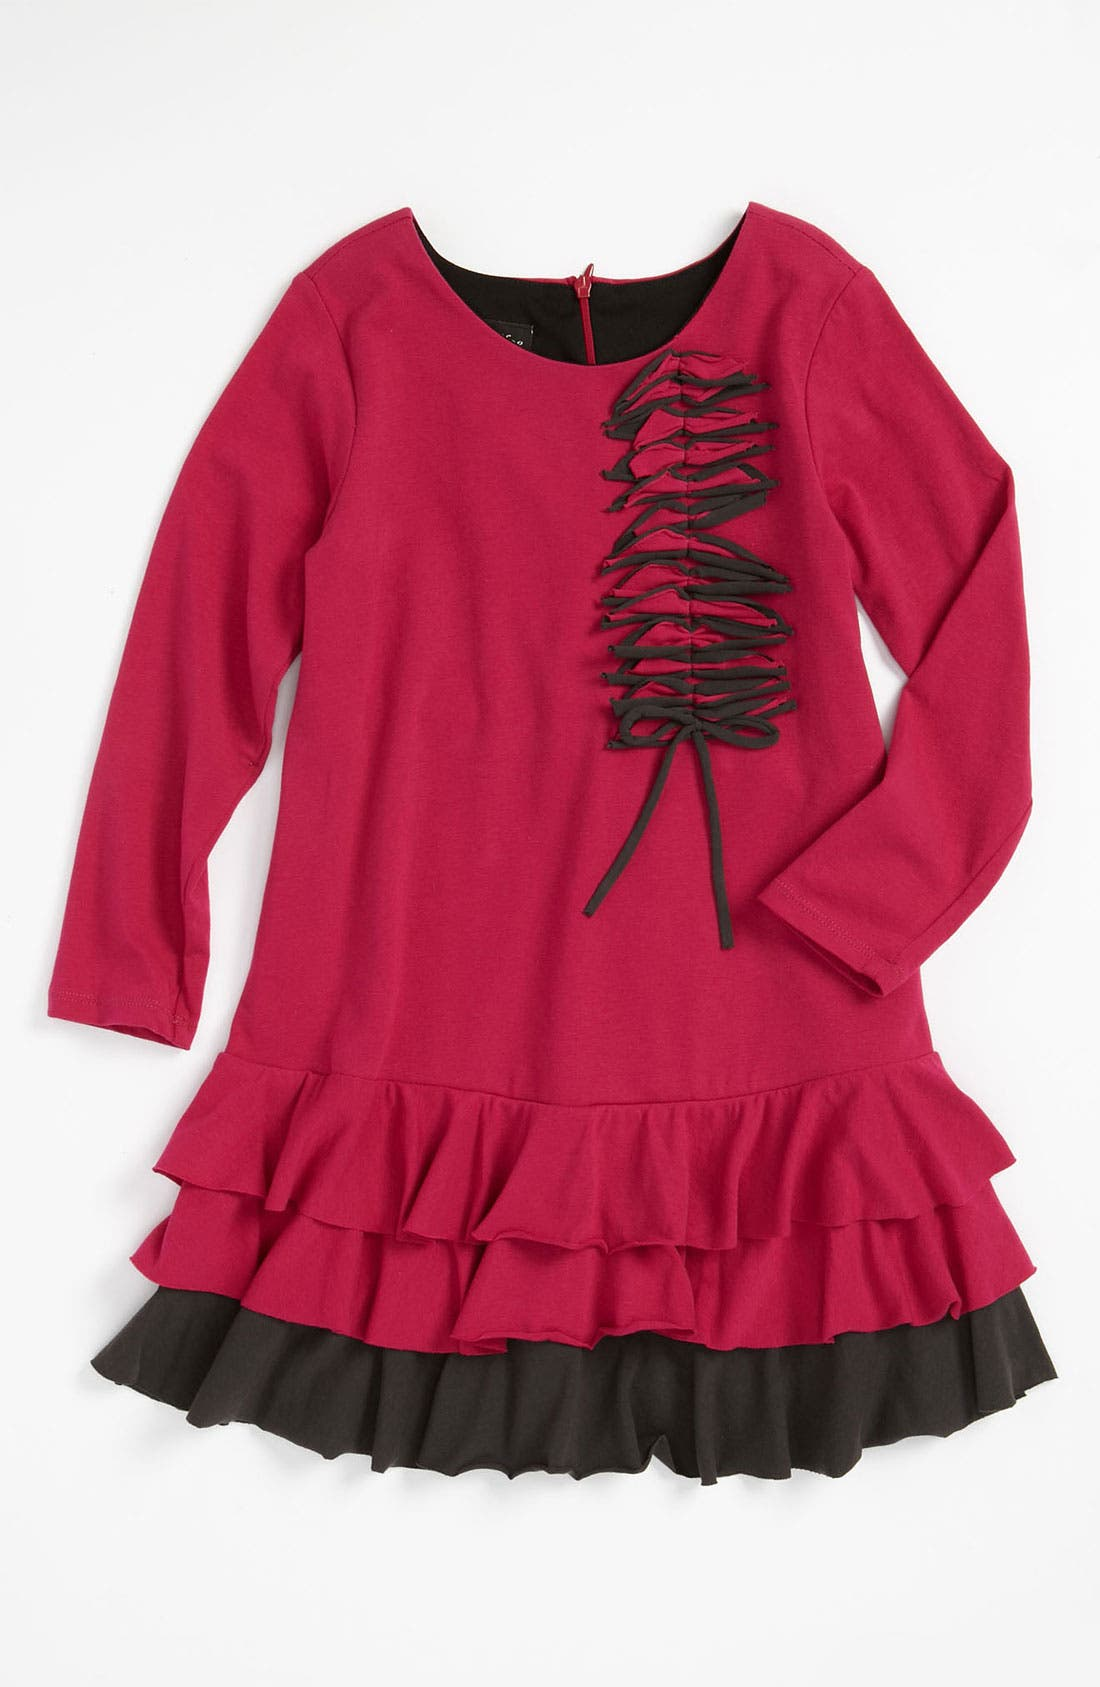 Main Image - Isobella & Chloe 'Fireworks' Knit Dress (Little Girls & Big Girls)